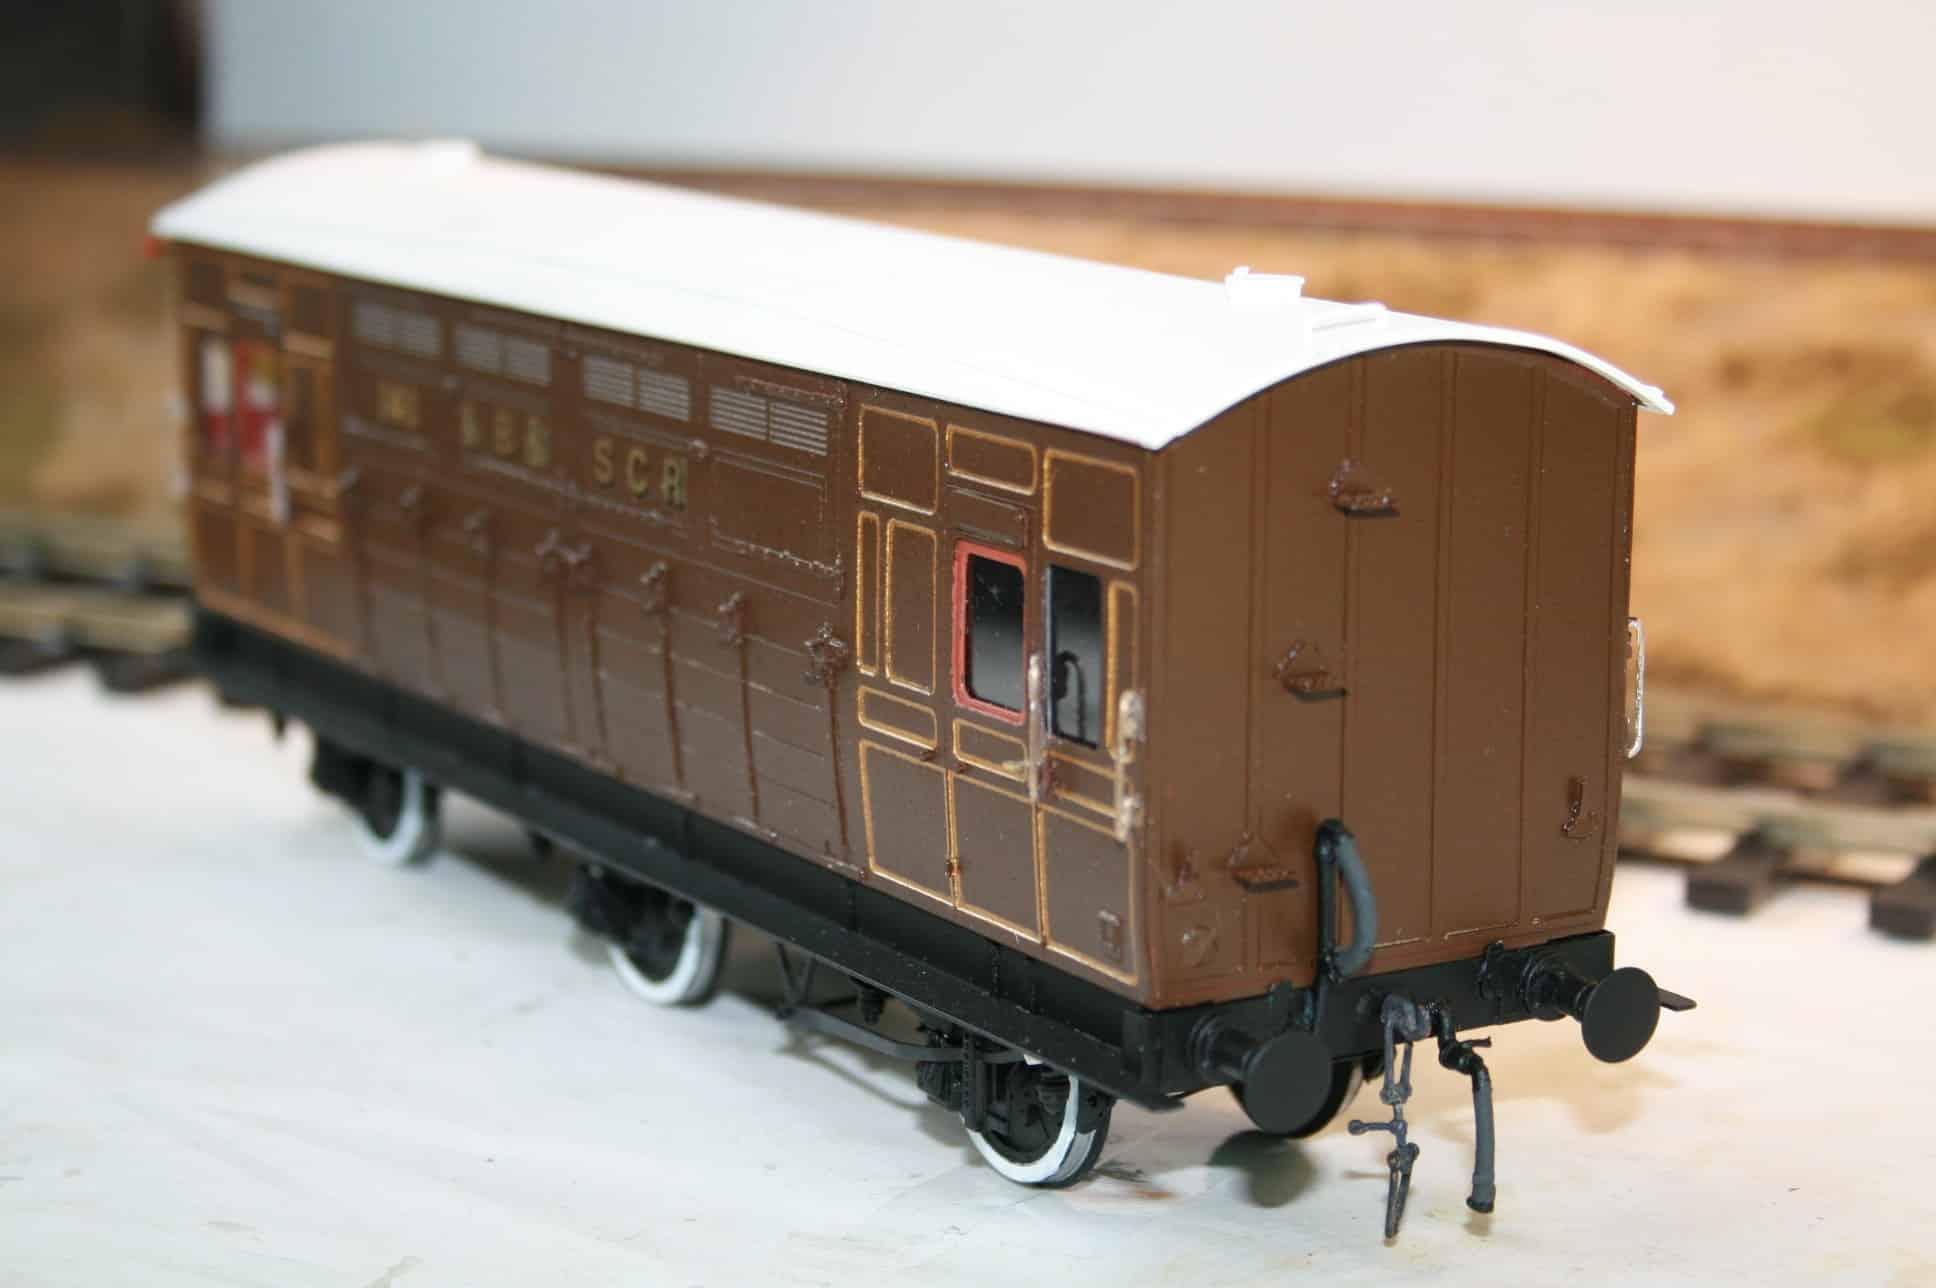 LB&SCR Dia.142/274 6 wheel Horsebox r/n 141